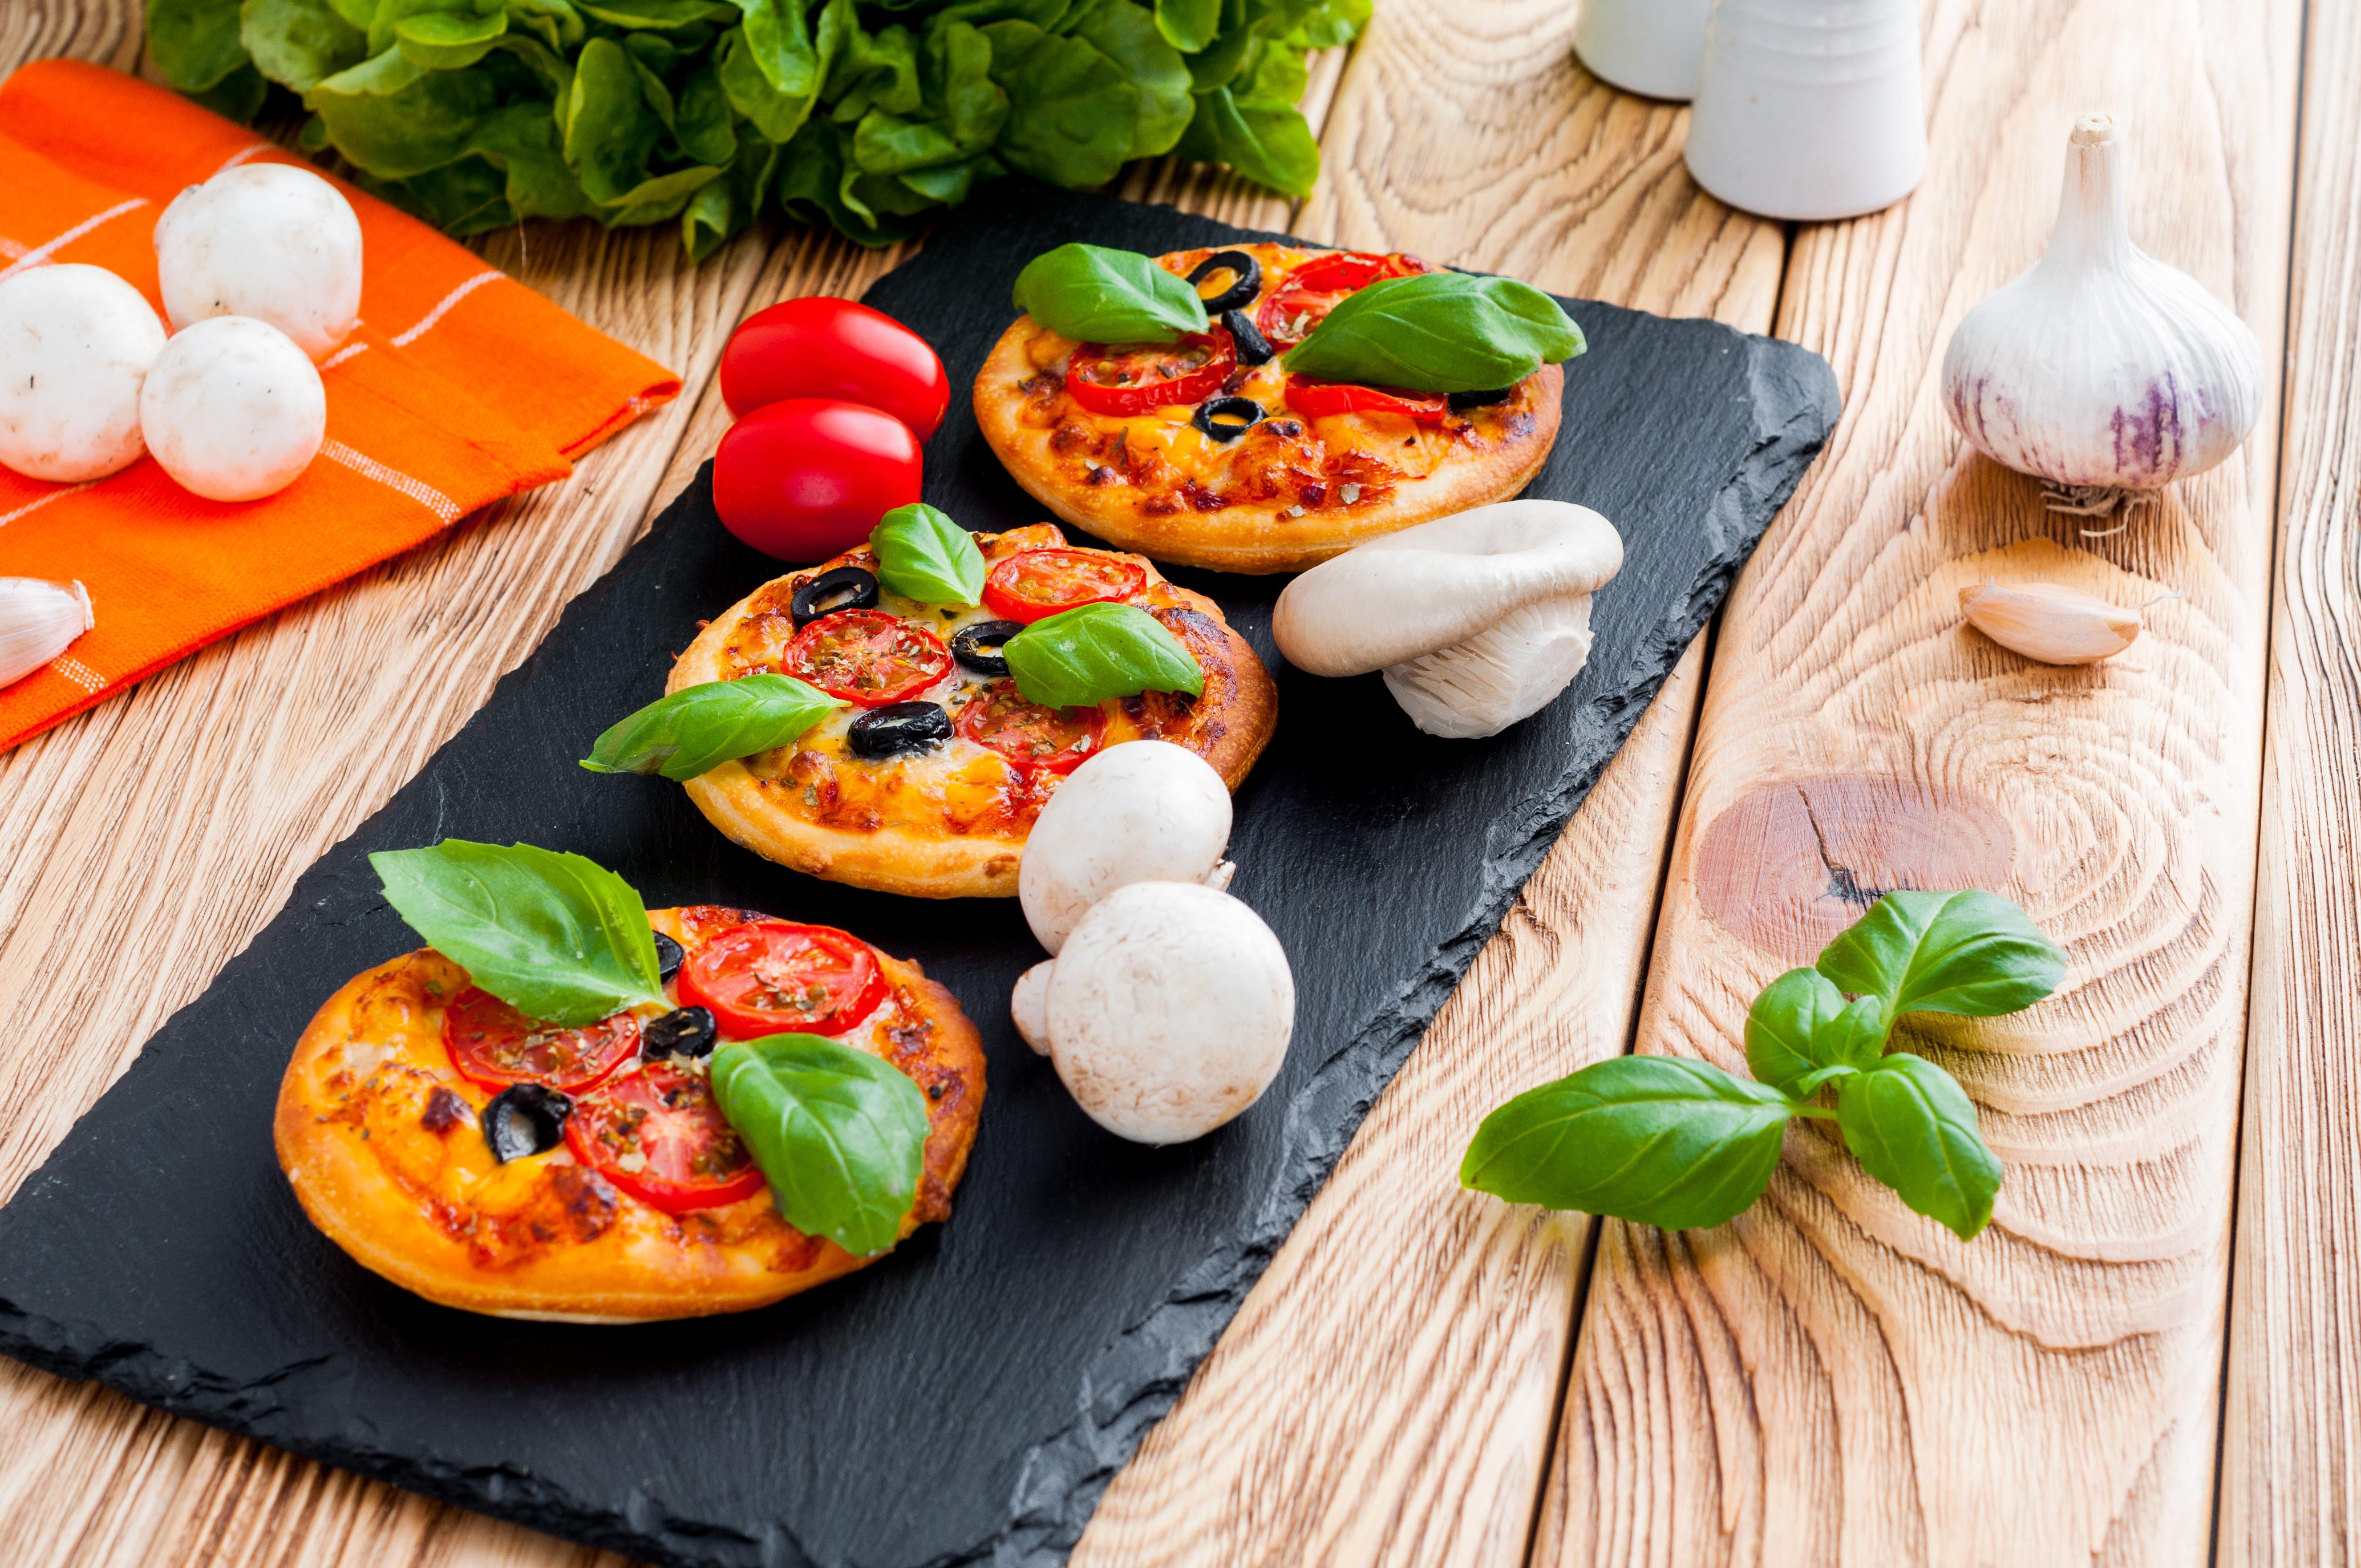 Pizzerinki (mini pizze) z oliwkami, pomidorkami i serkiem w plasterkach Cheddar